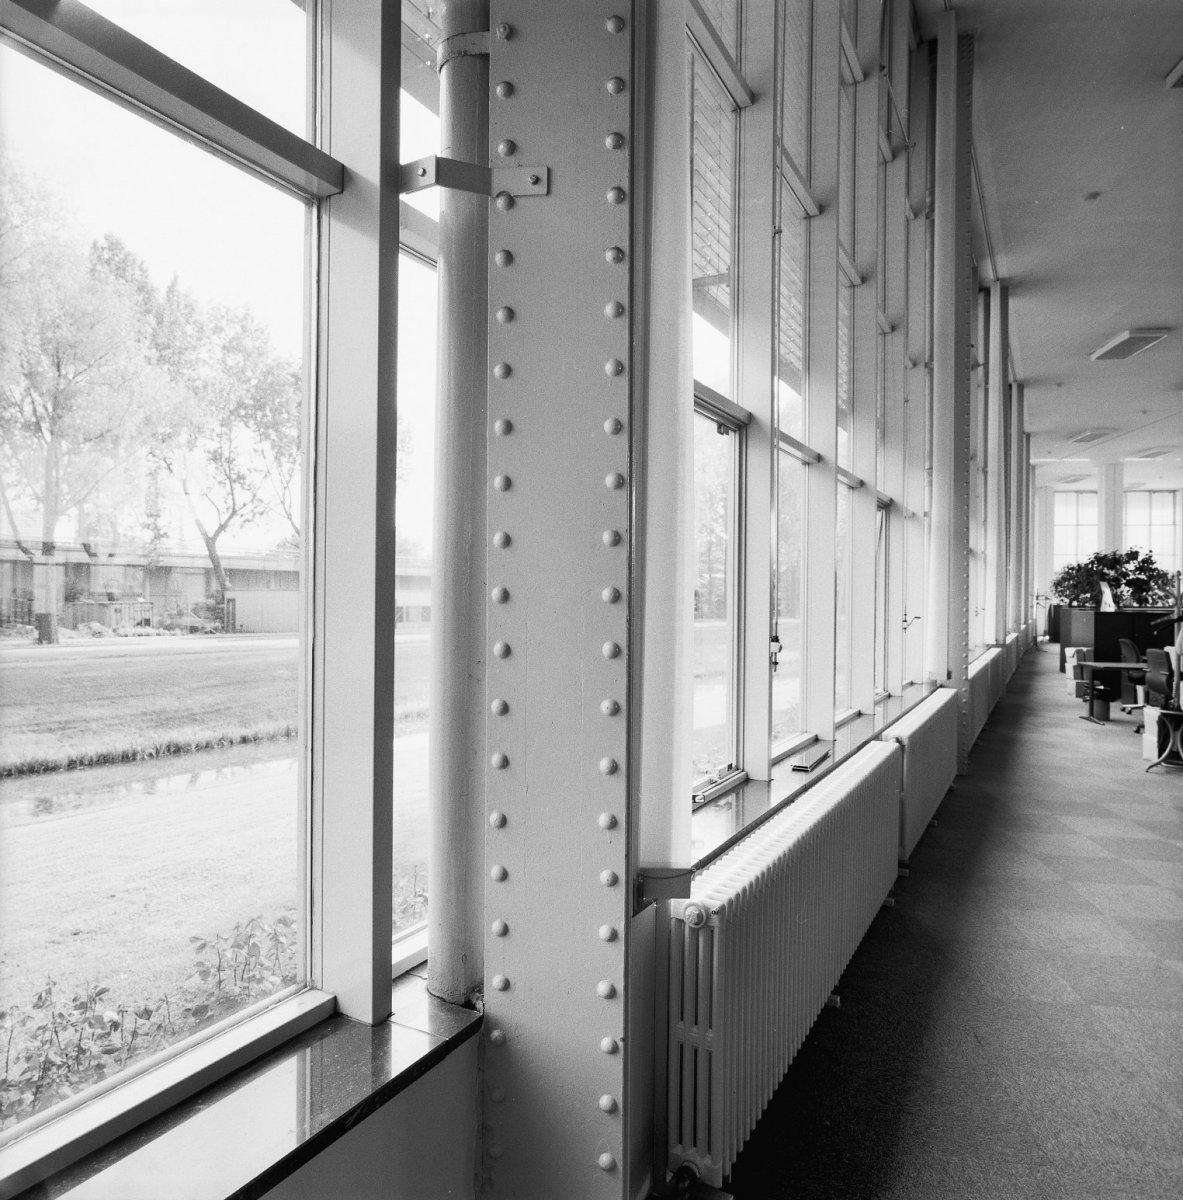 File interieur kantoorgebouw binnenaanzicht vliesgevel for Interieur rotterdam